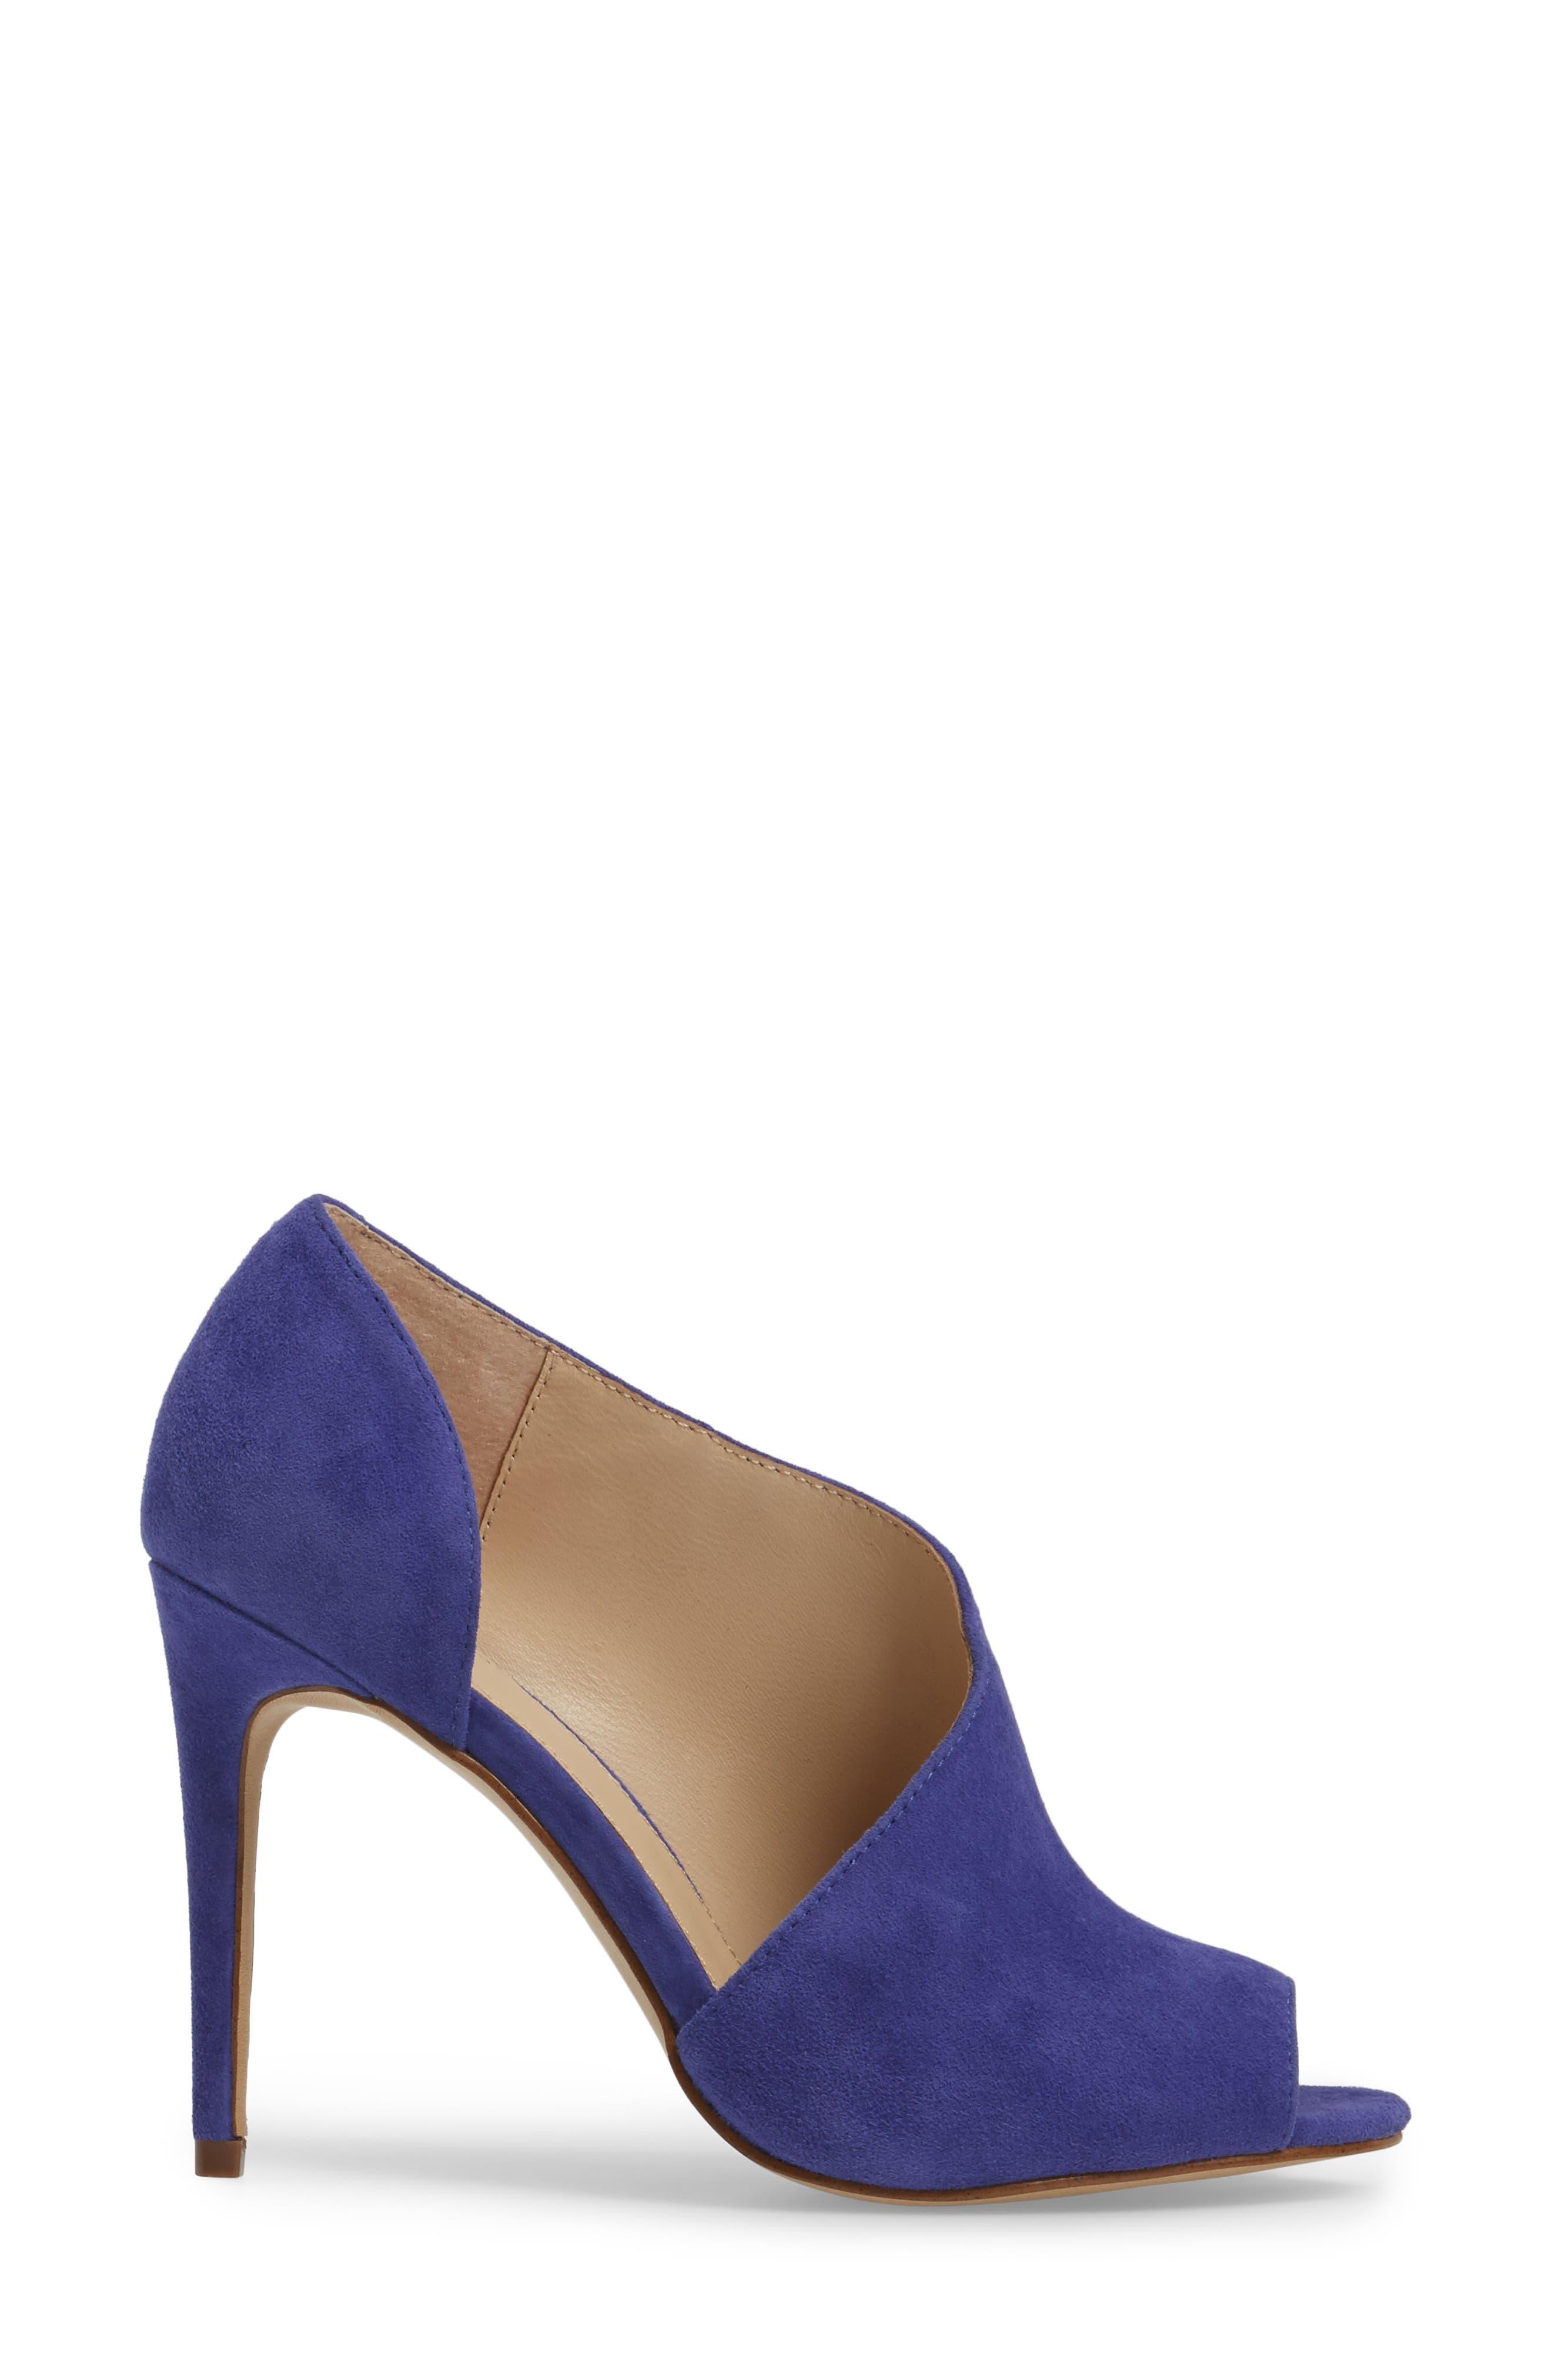 Adelia Asymmetrical Sandal,                             Alternate thumbnail 3, color,                             Blue